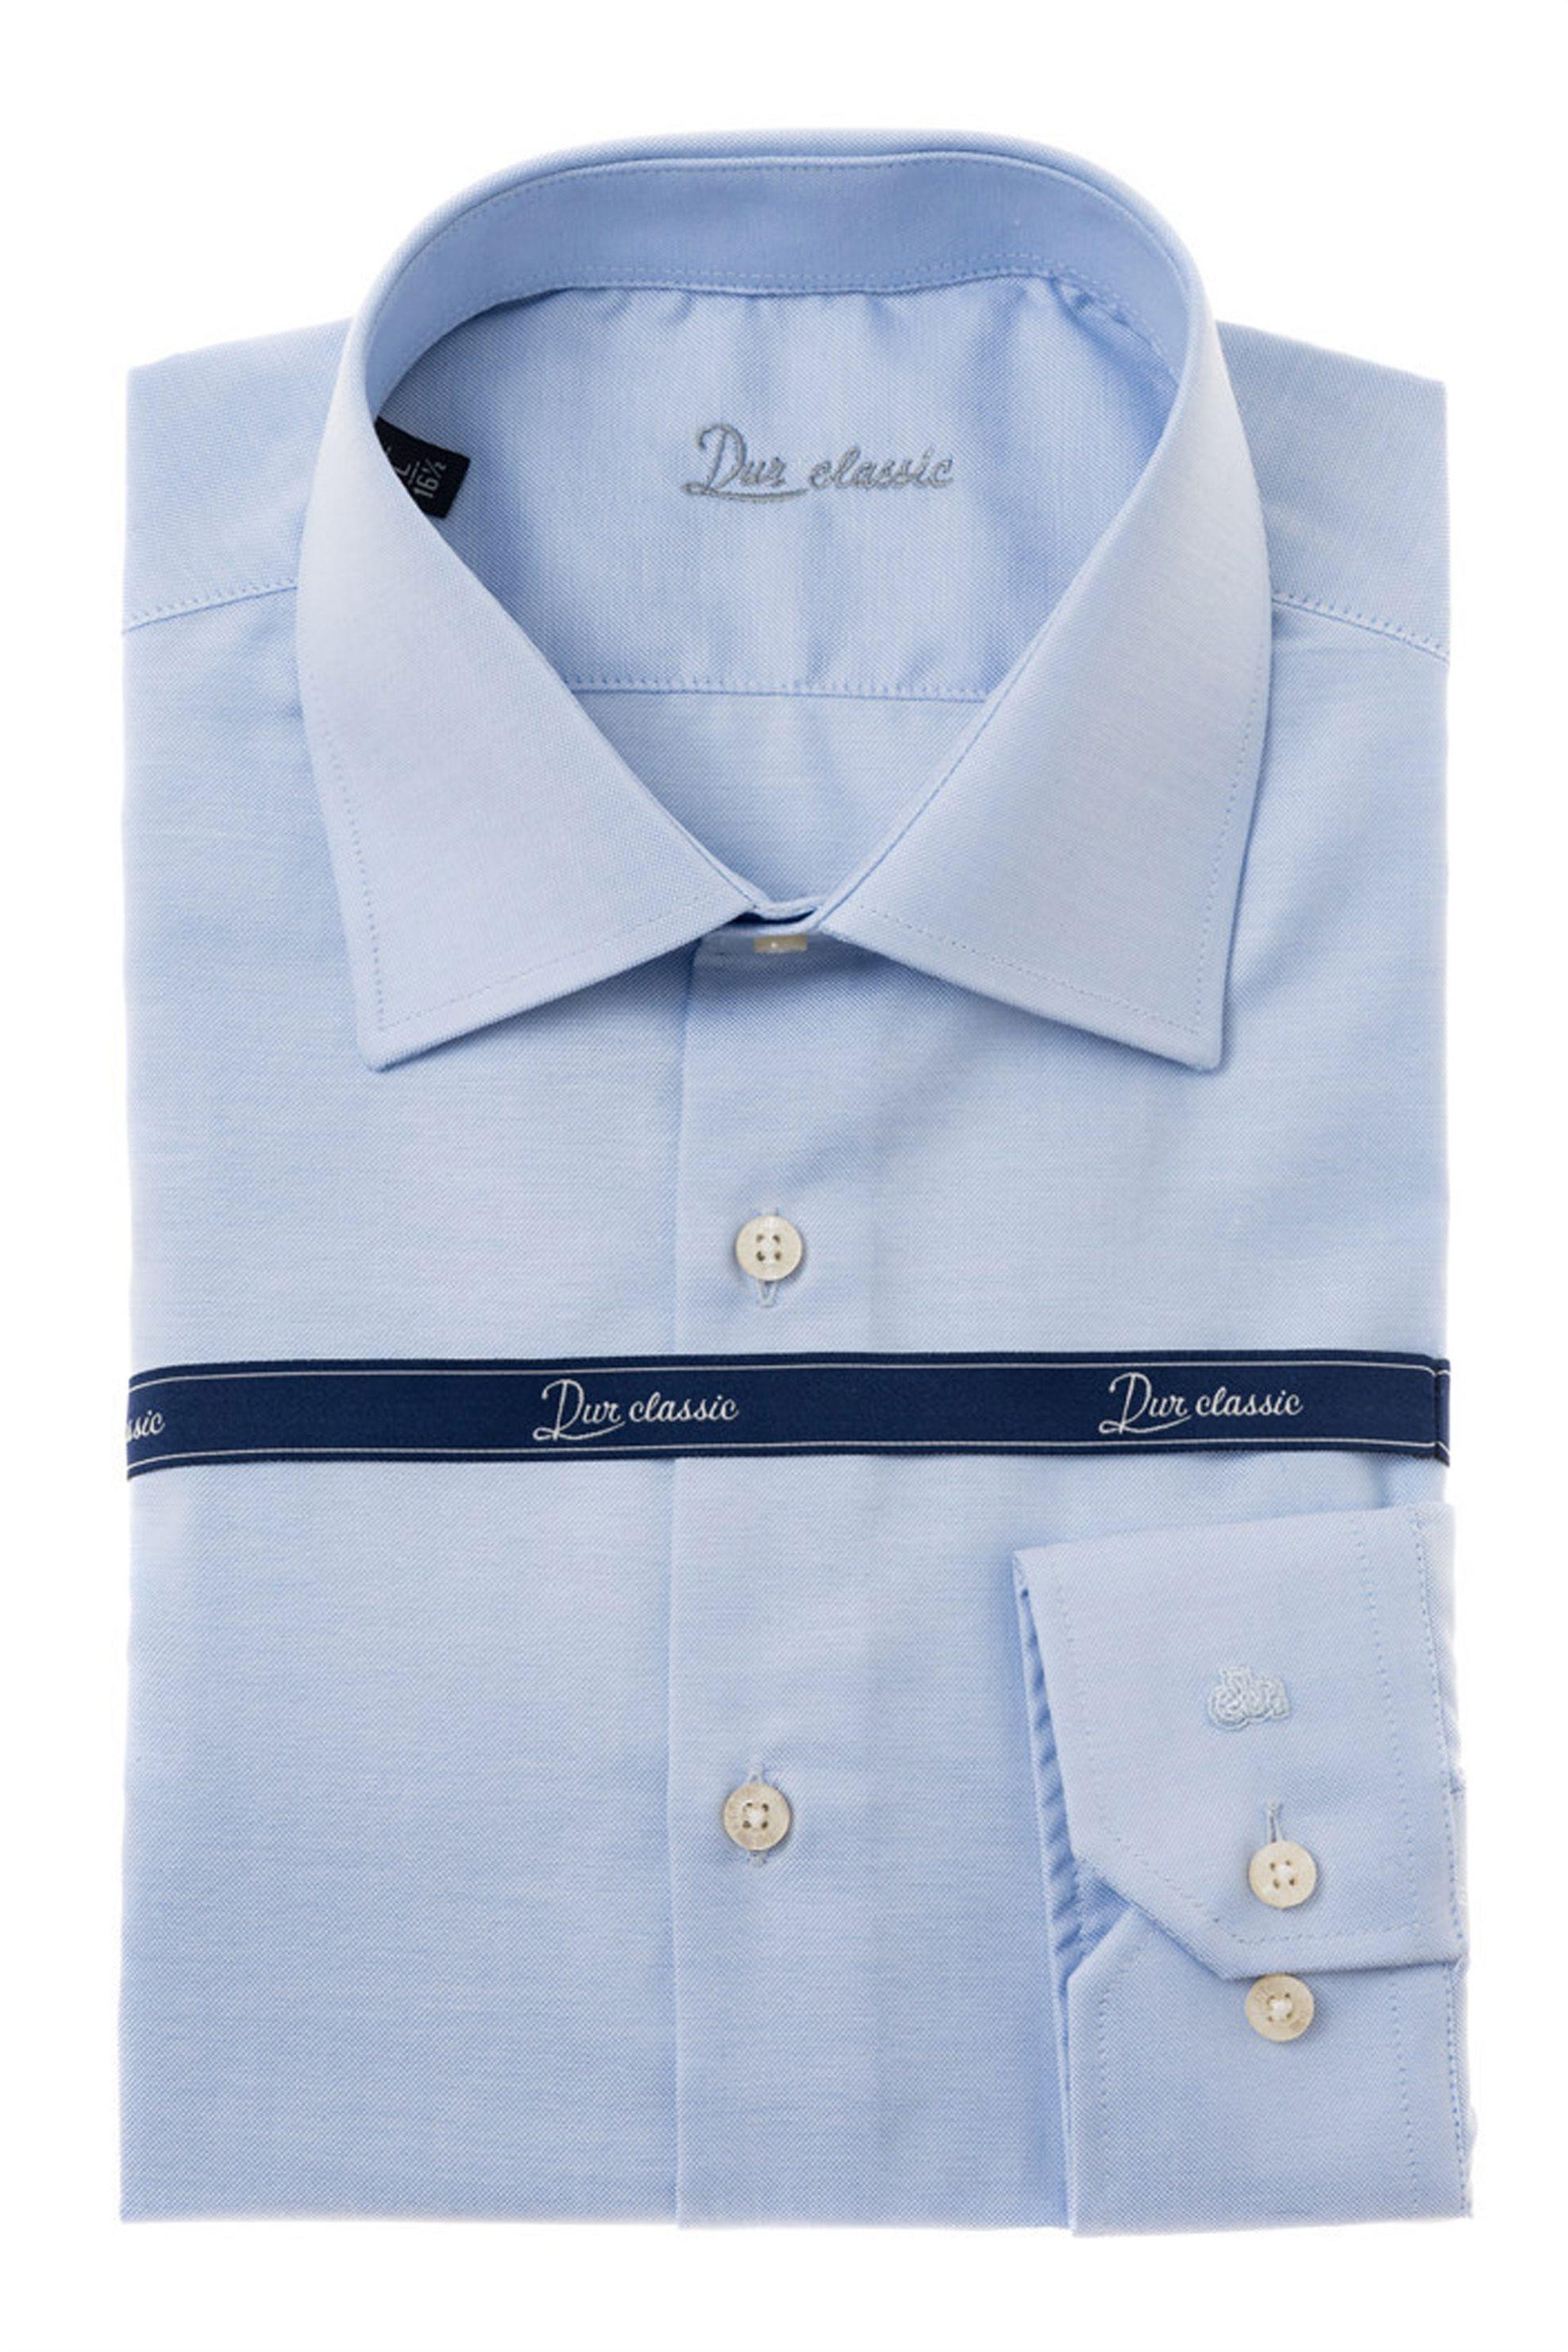 e06512f9b976 Notos Dur ανδρικό πουκάμισο Oxford - 10000046 - Γαλάζιο